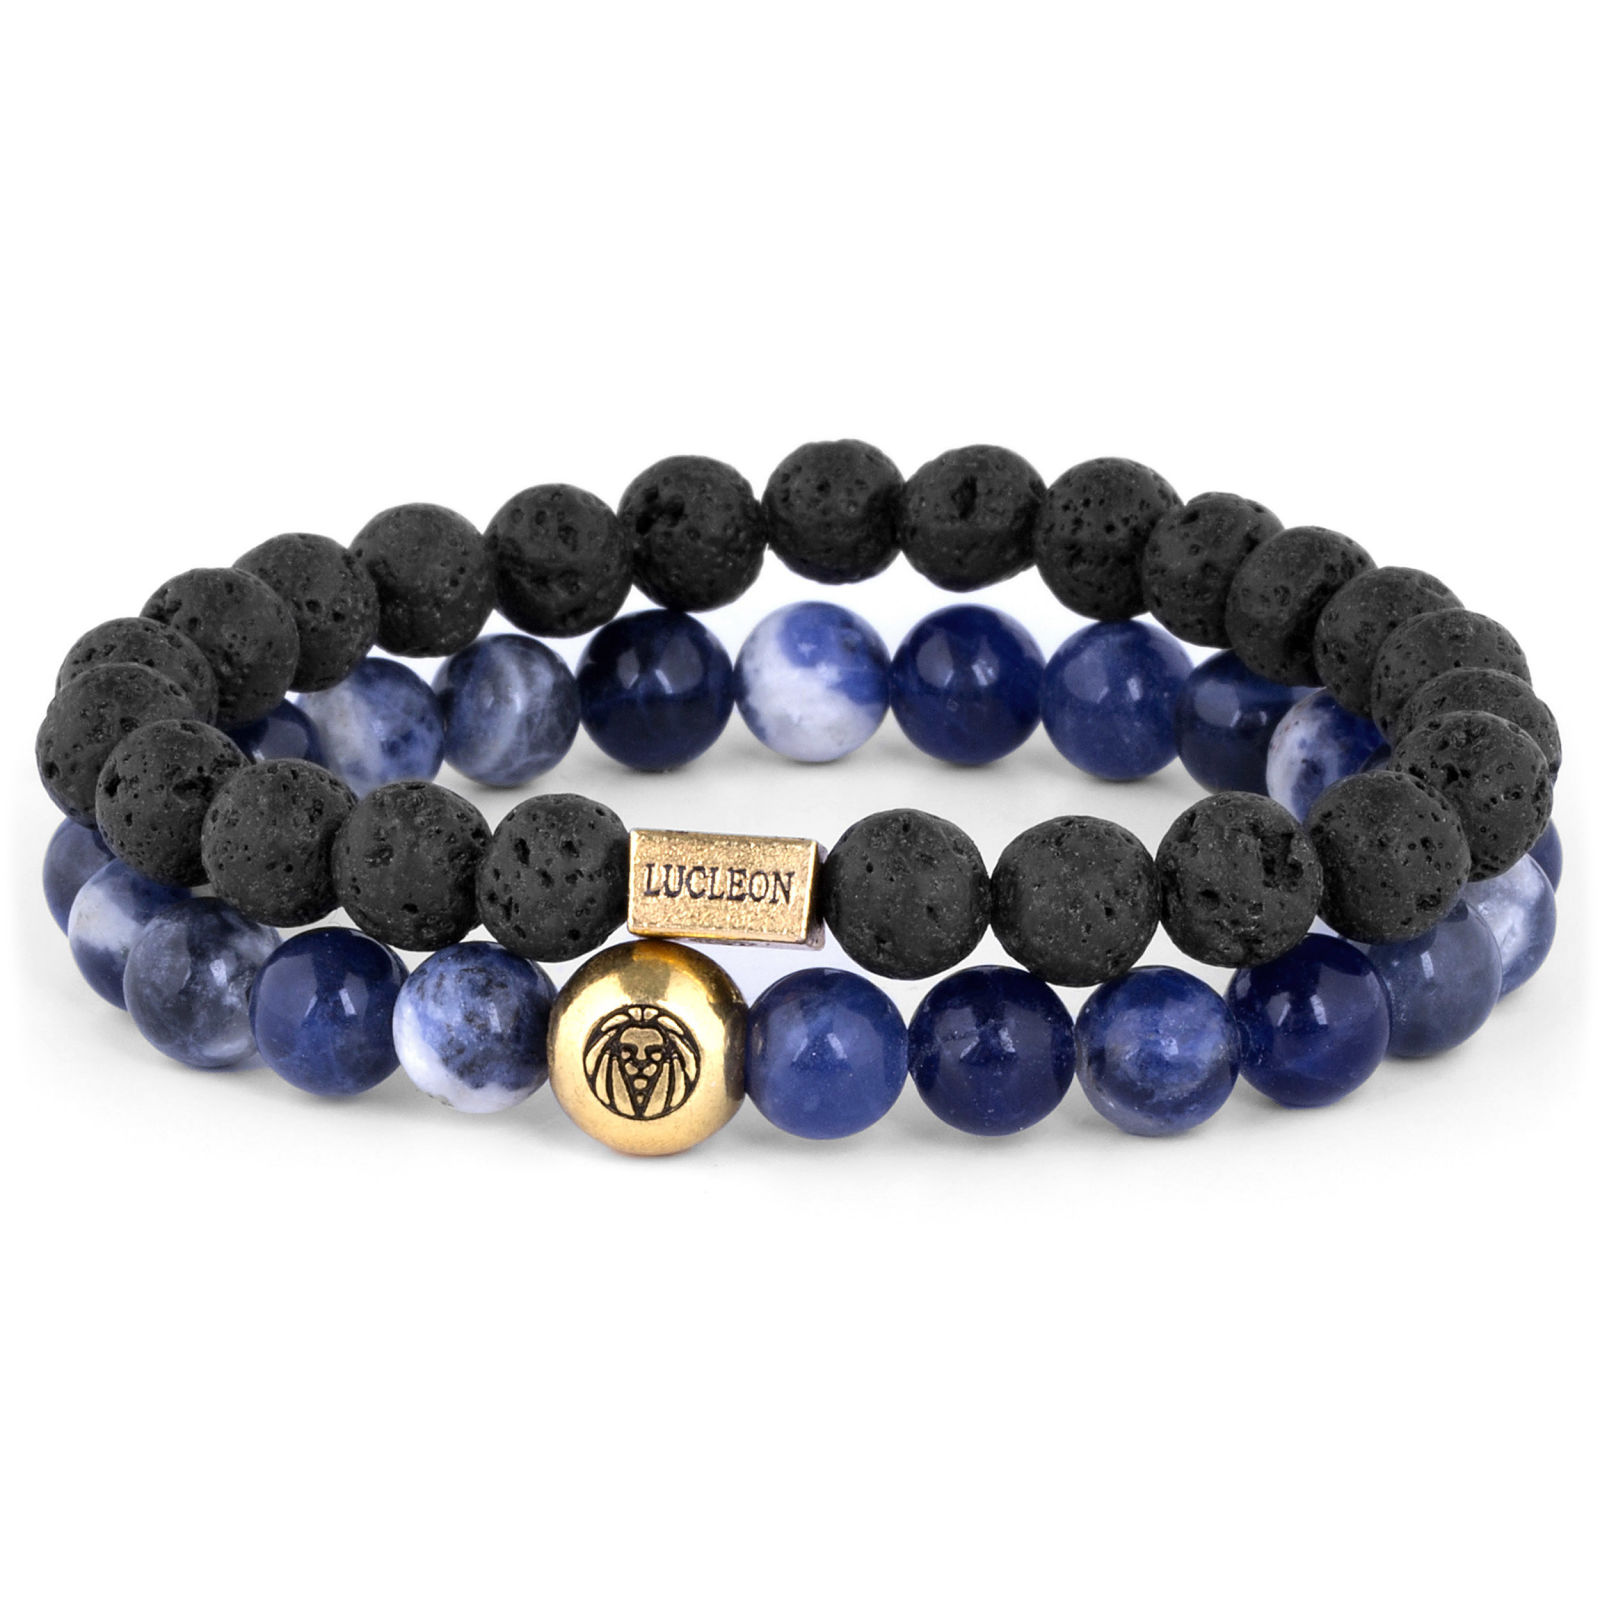 Blå Agat   Lavasten Miro Armband  22a739f59009e